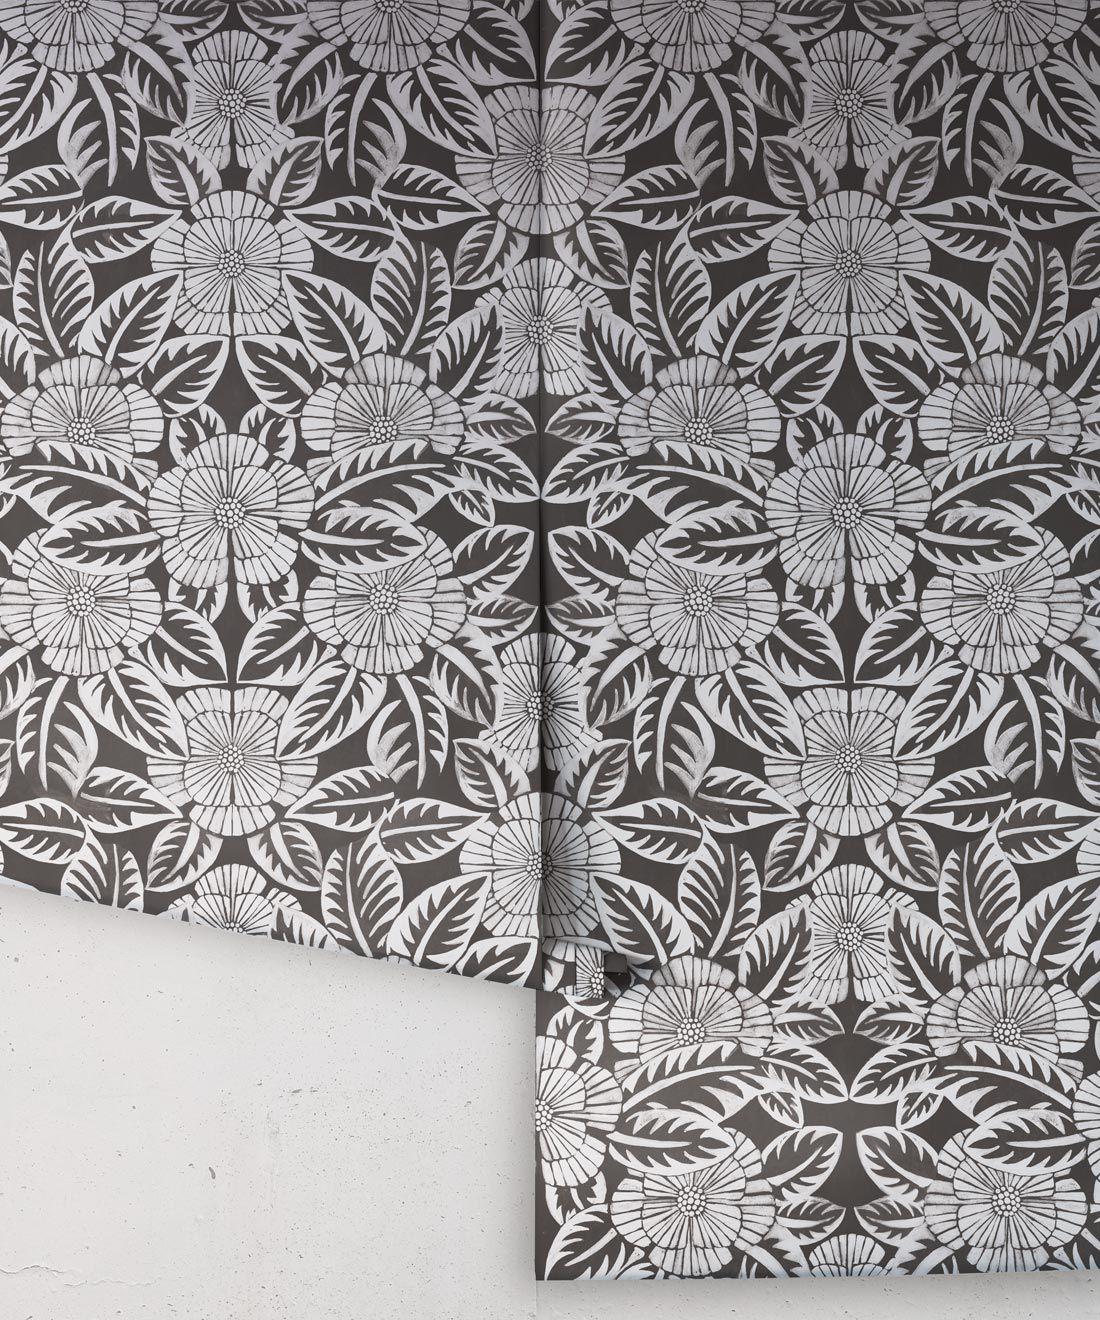 Calcutta Wallpaper • Flower and Leaf Motif Design • Ethnic Wallpaper • Charcoal Wallpaper • Rolls